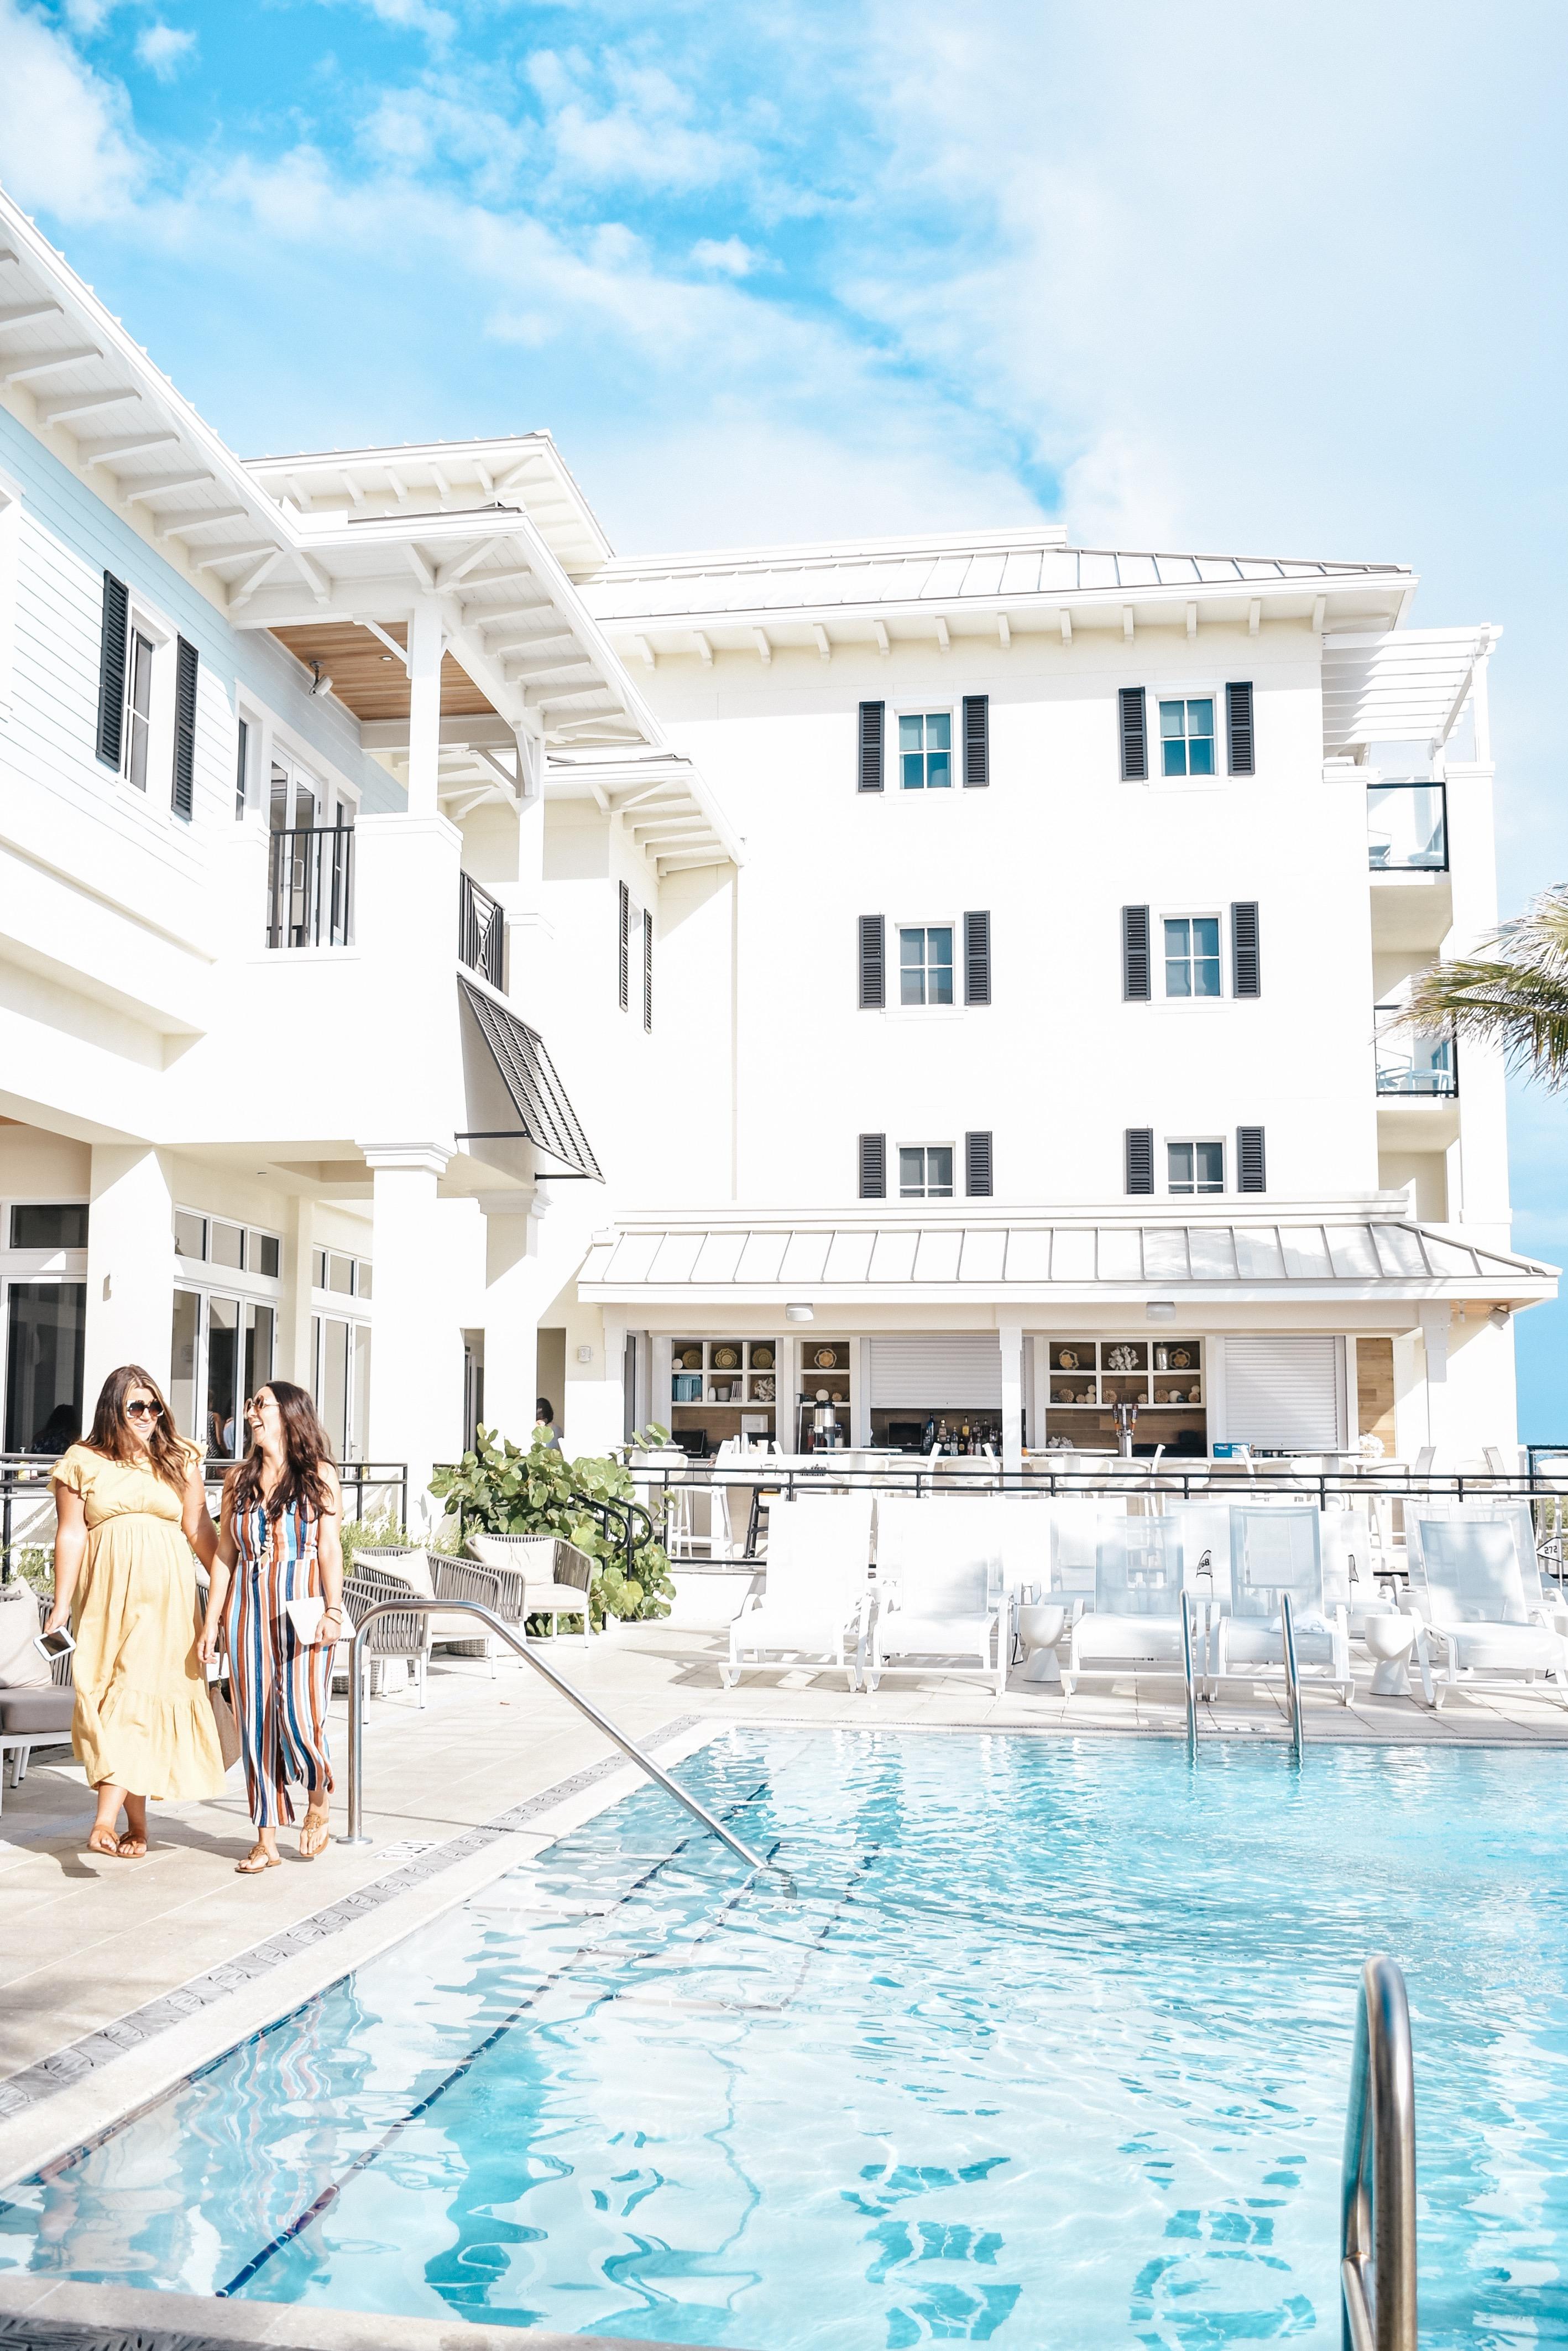 Hutchinson Shores - 30A Mama Travel - Girlfriends Getaway on Hutchinson Island